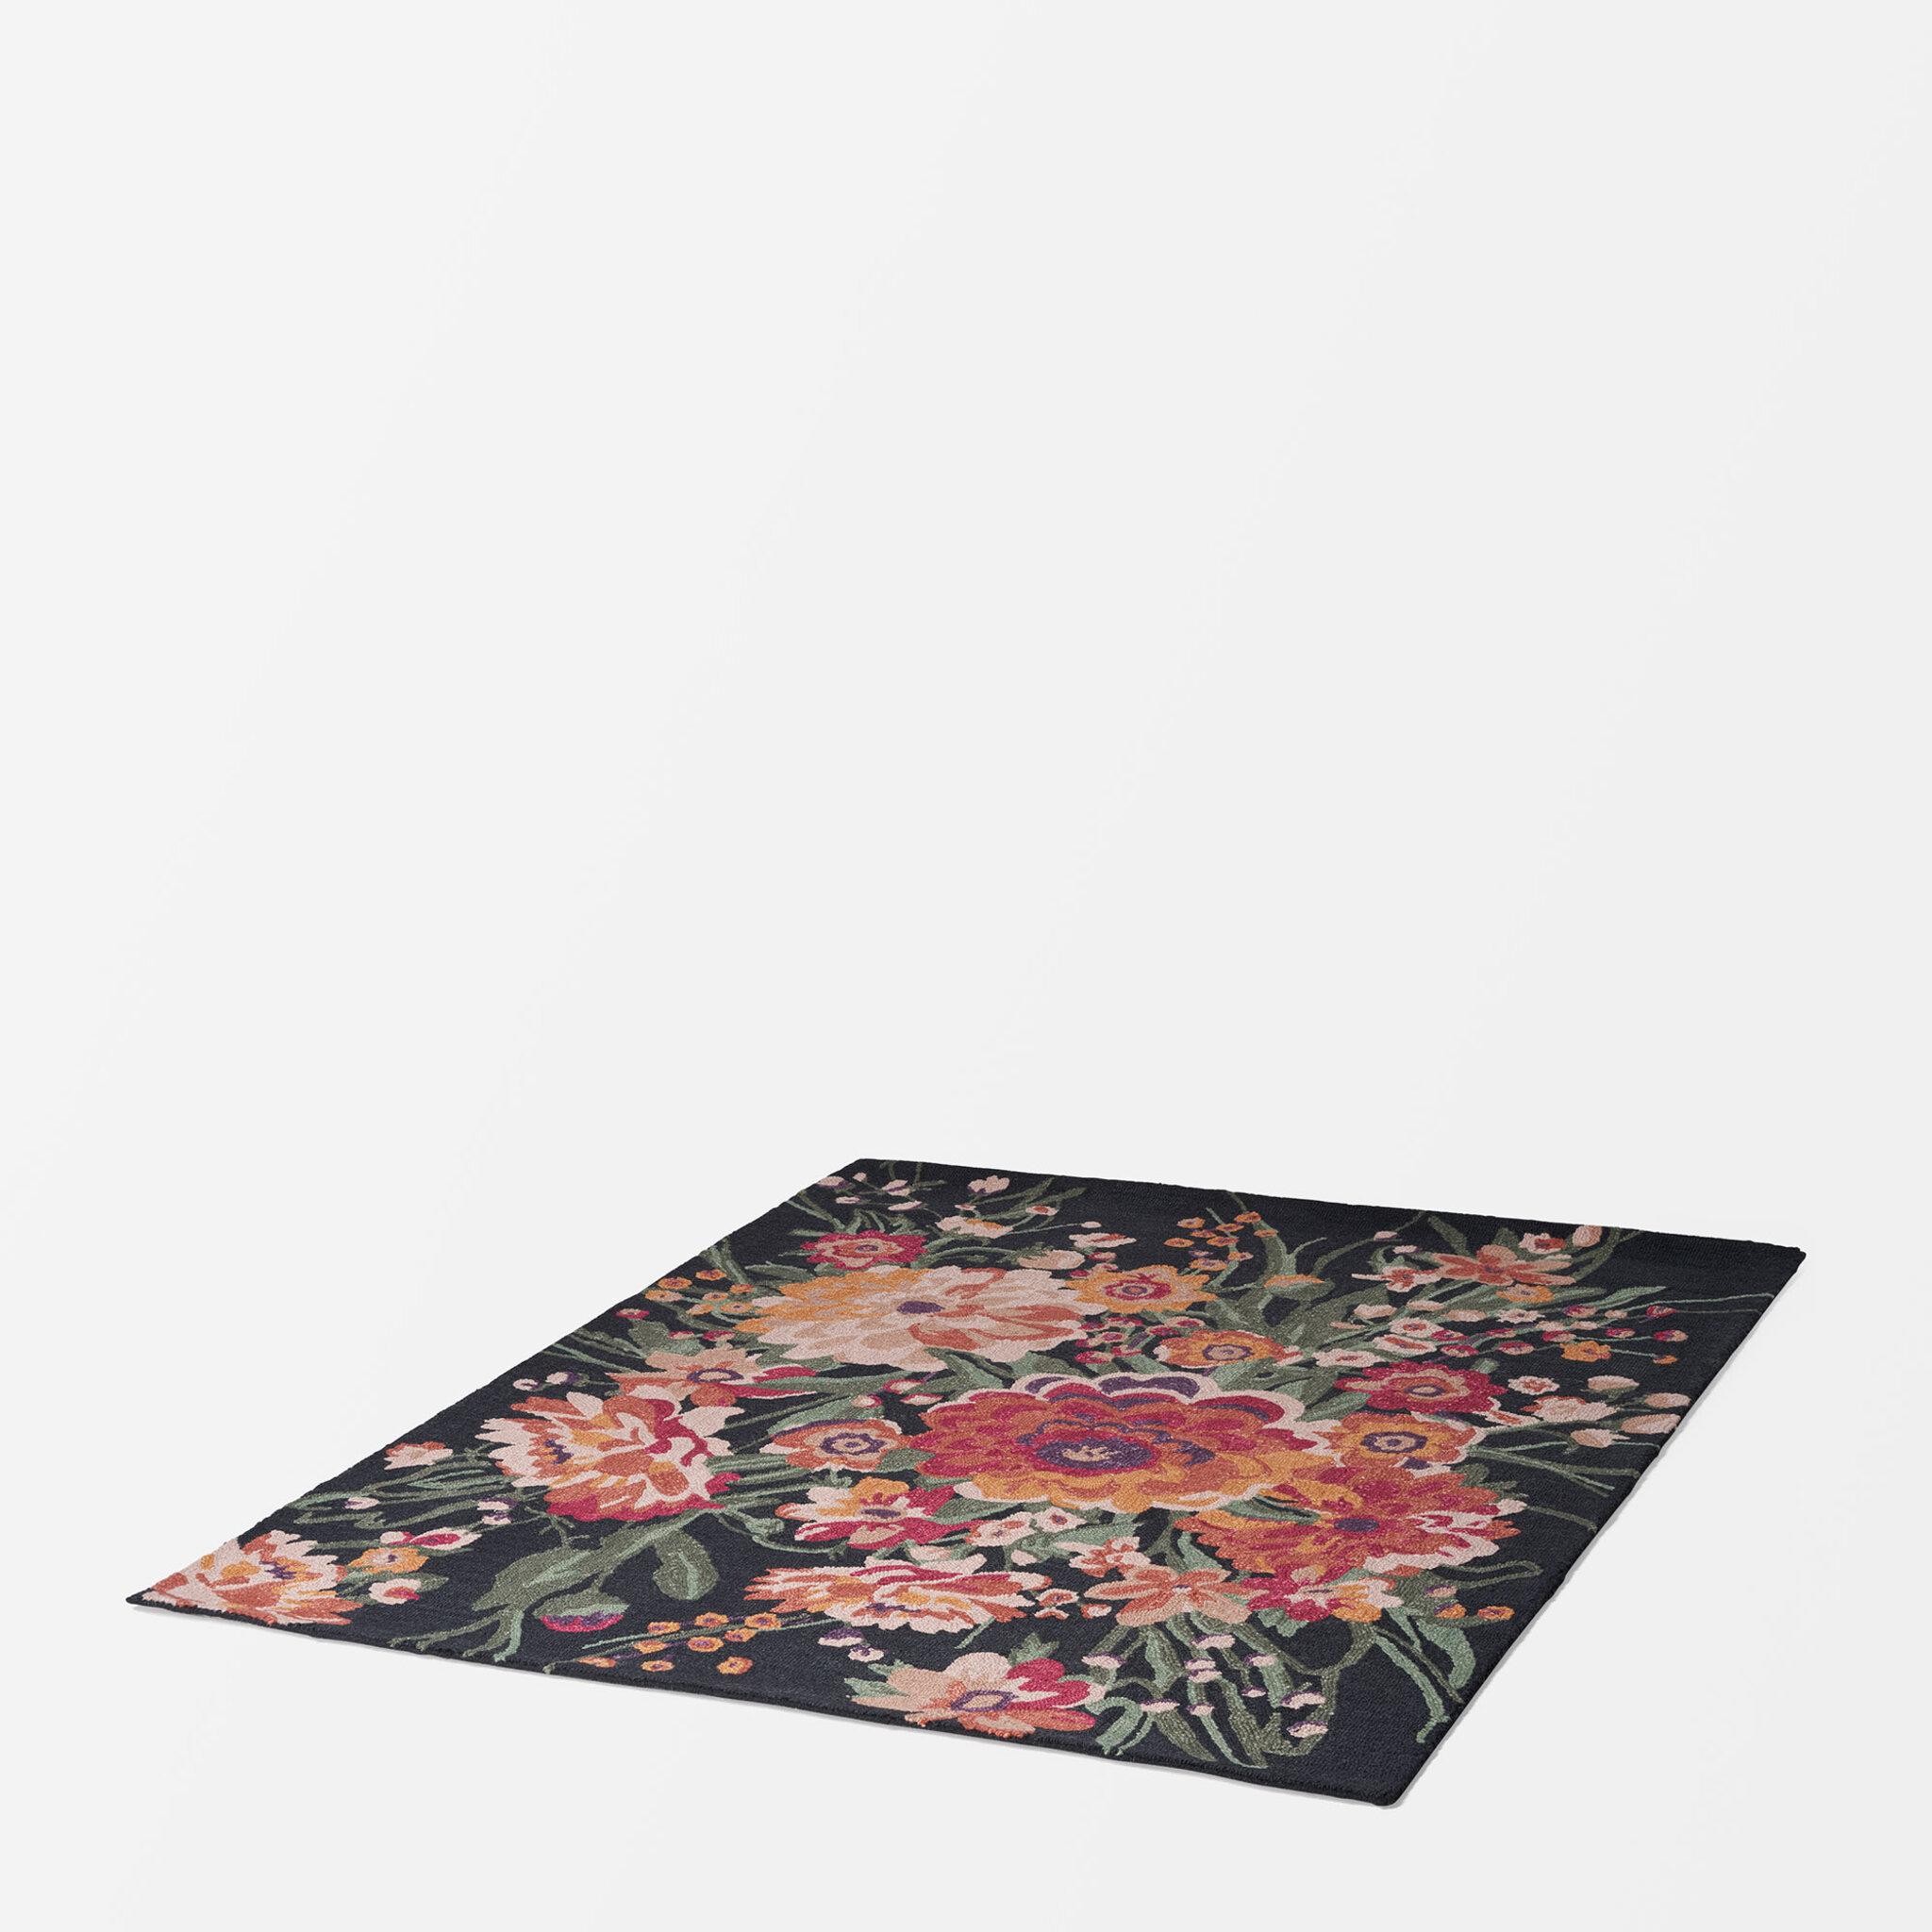 Handtuftad matta JENIKE 200X300 cm, 200X300